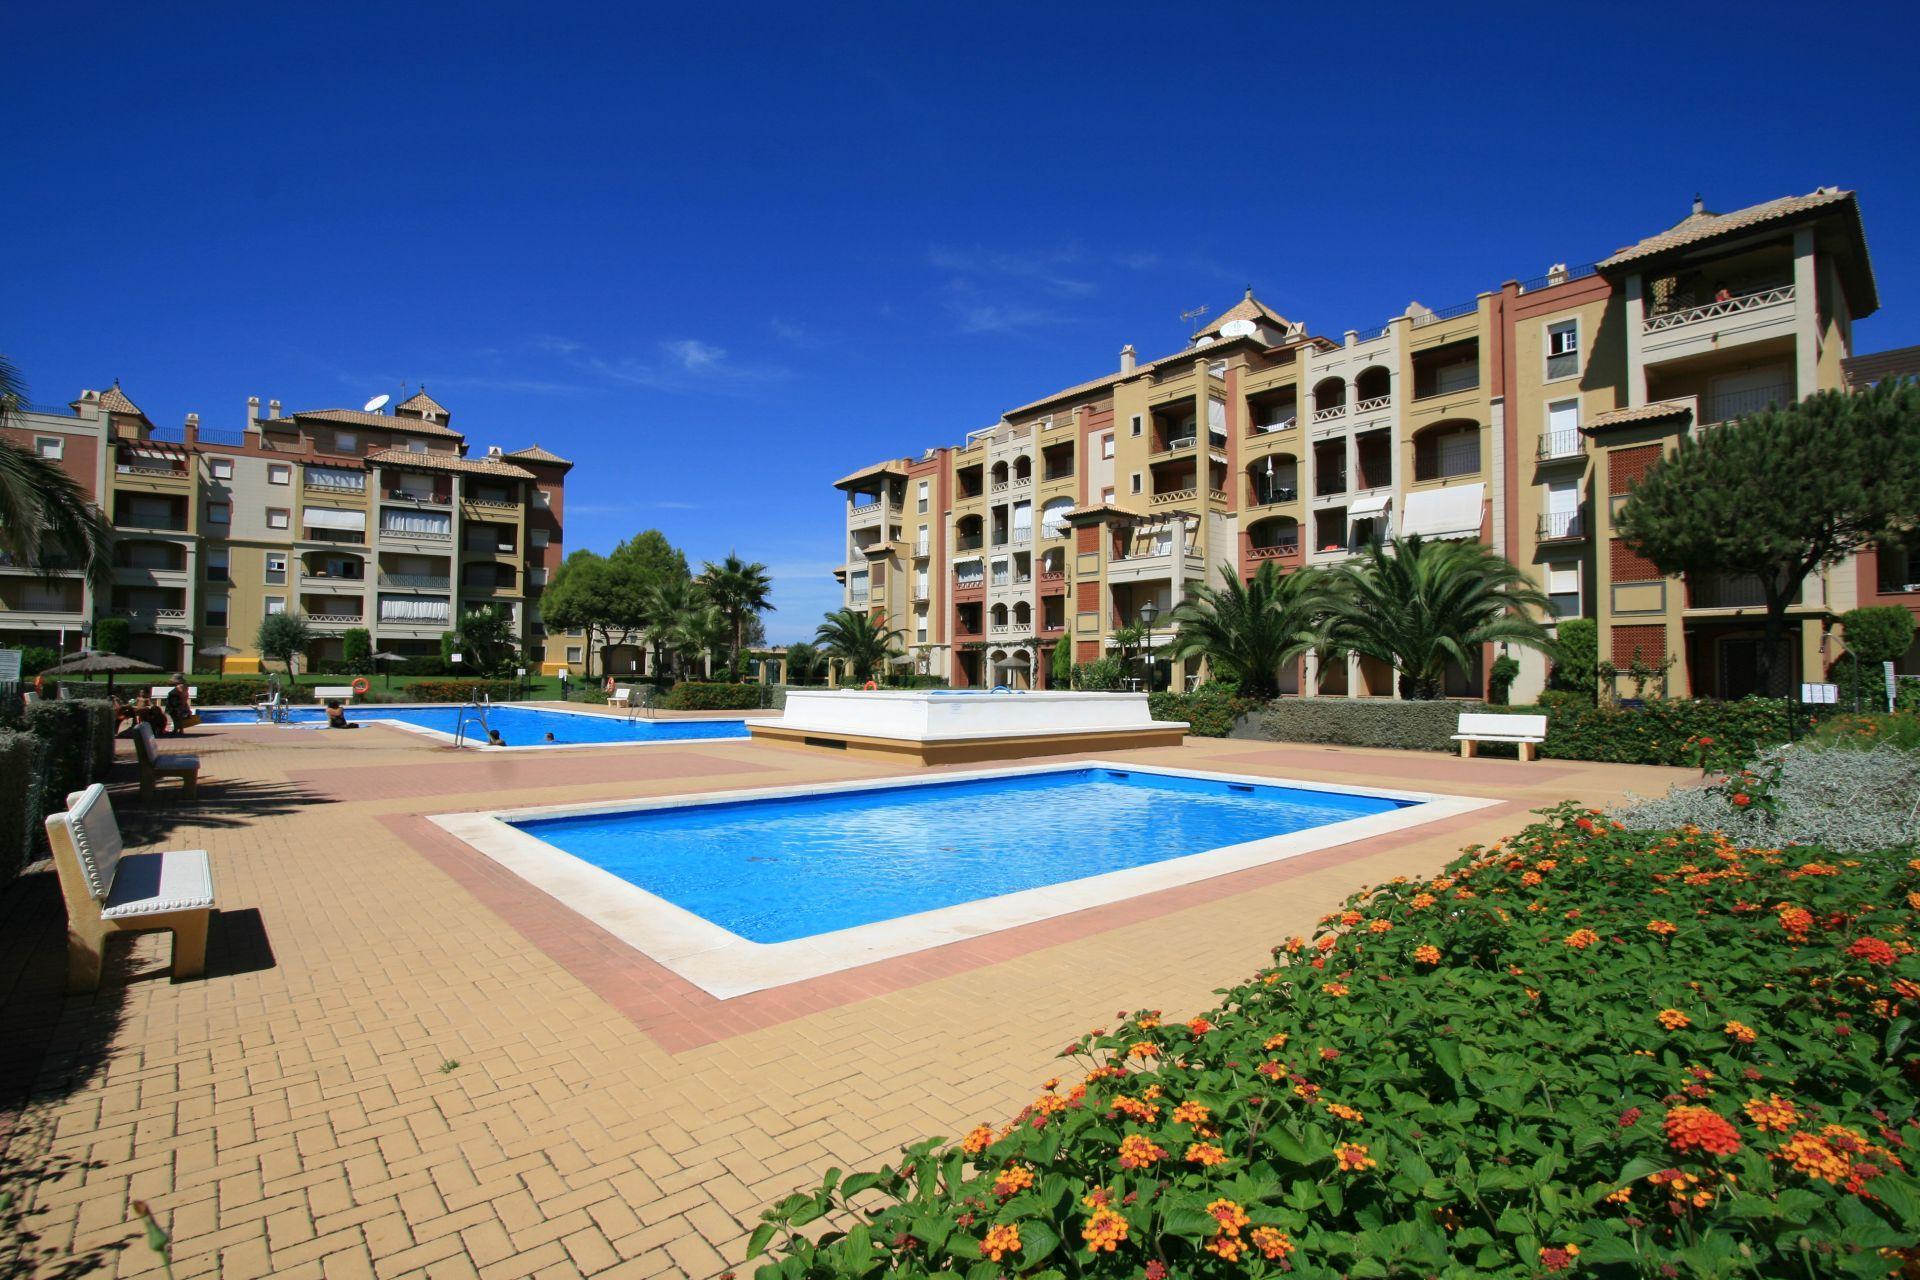 Alquiler de viviendas isla canela for Alquiler de viviendas